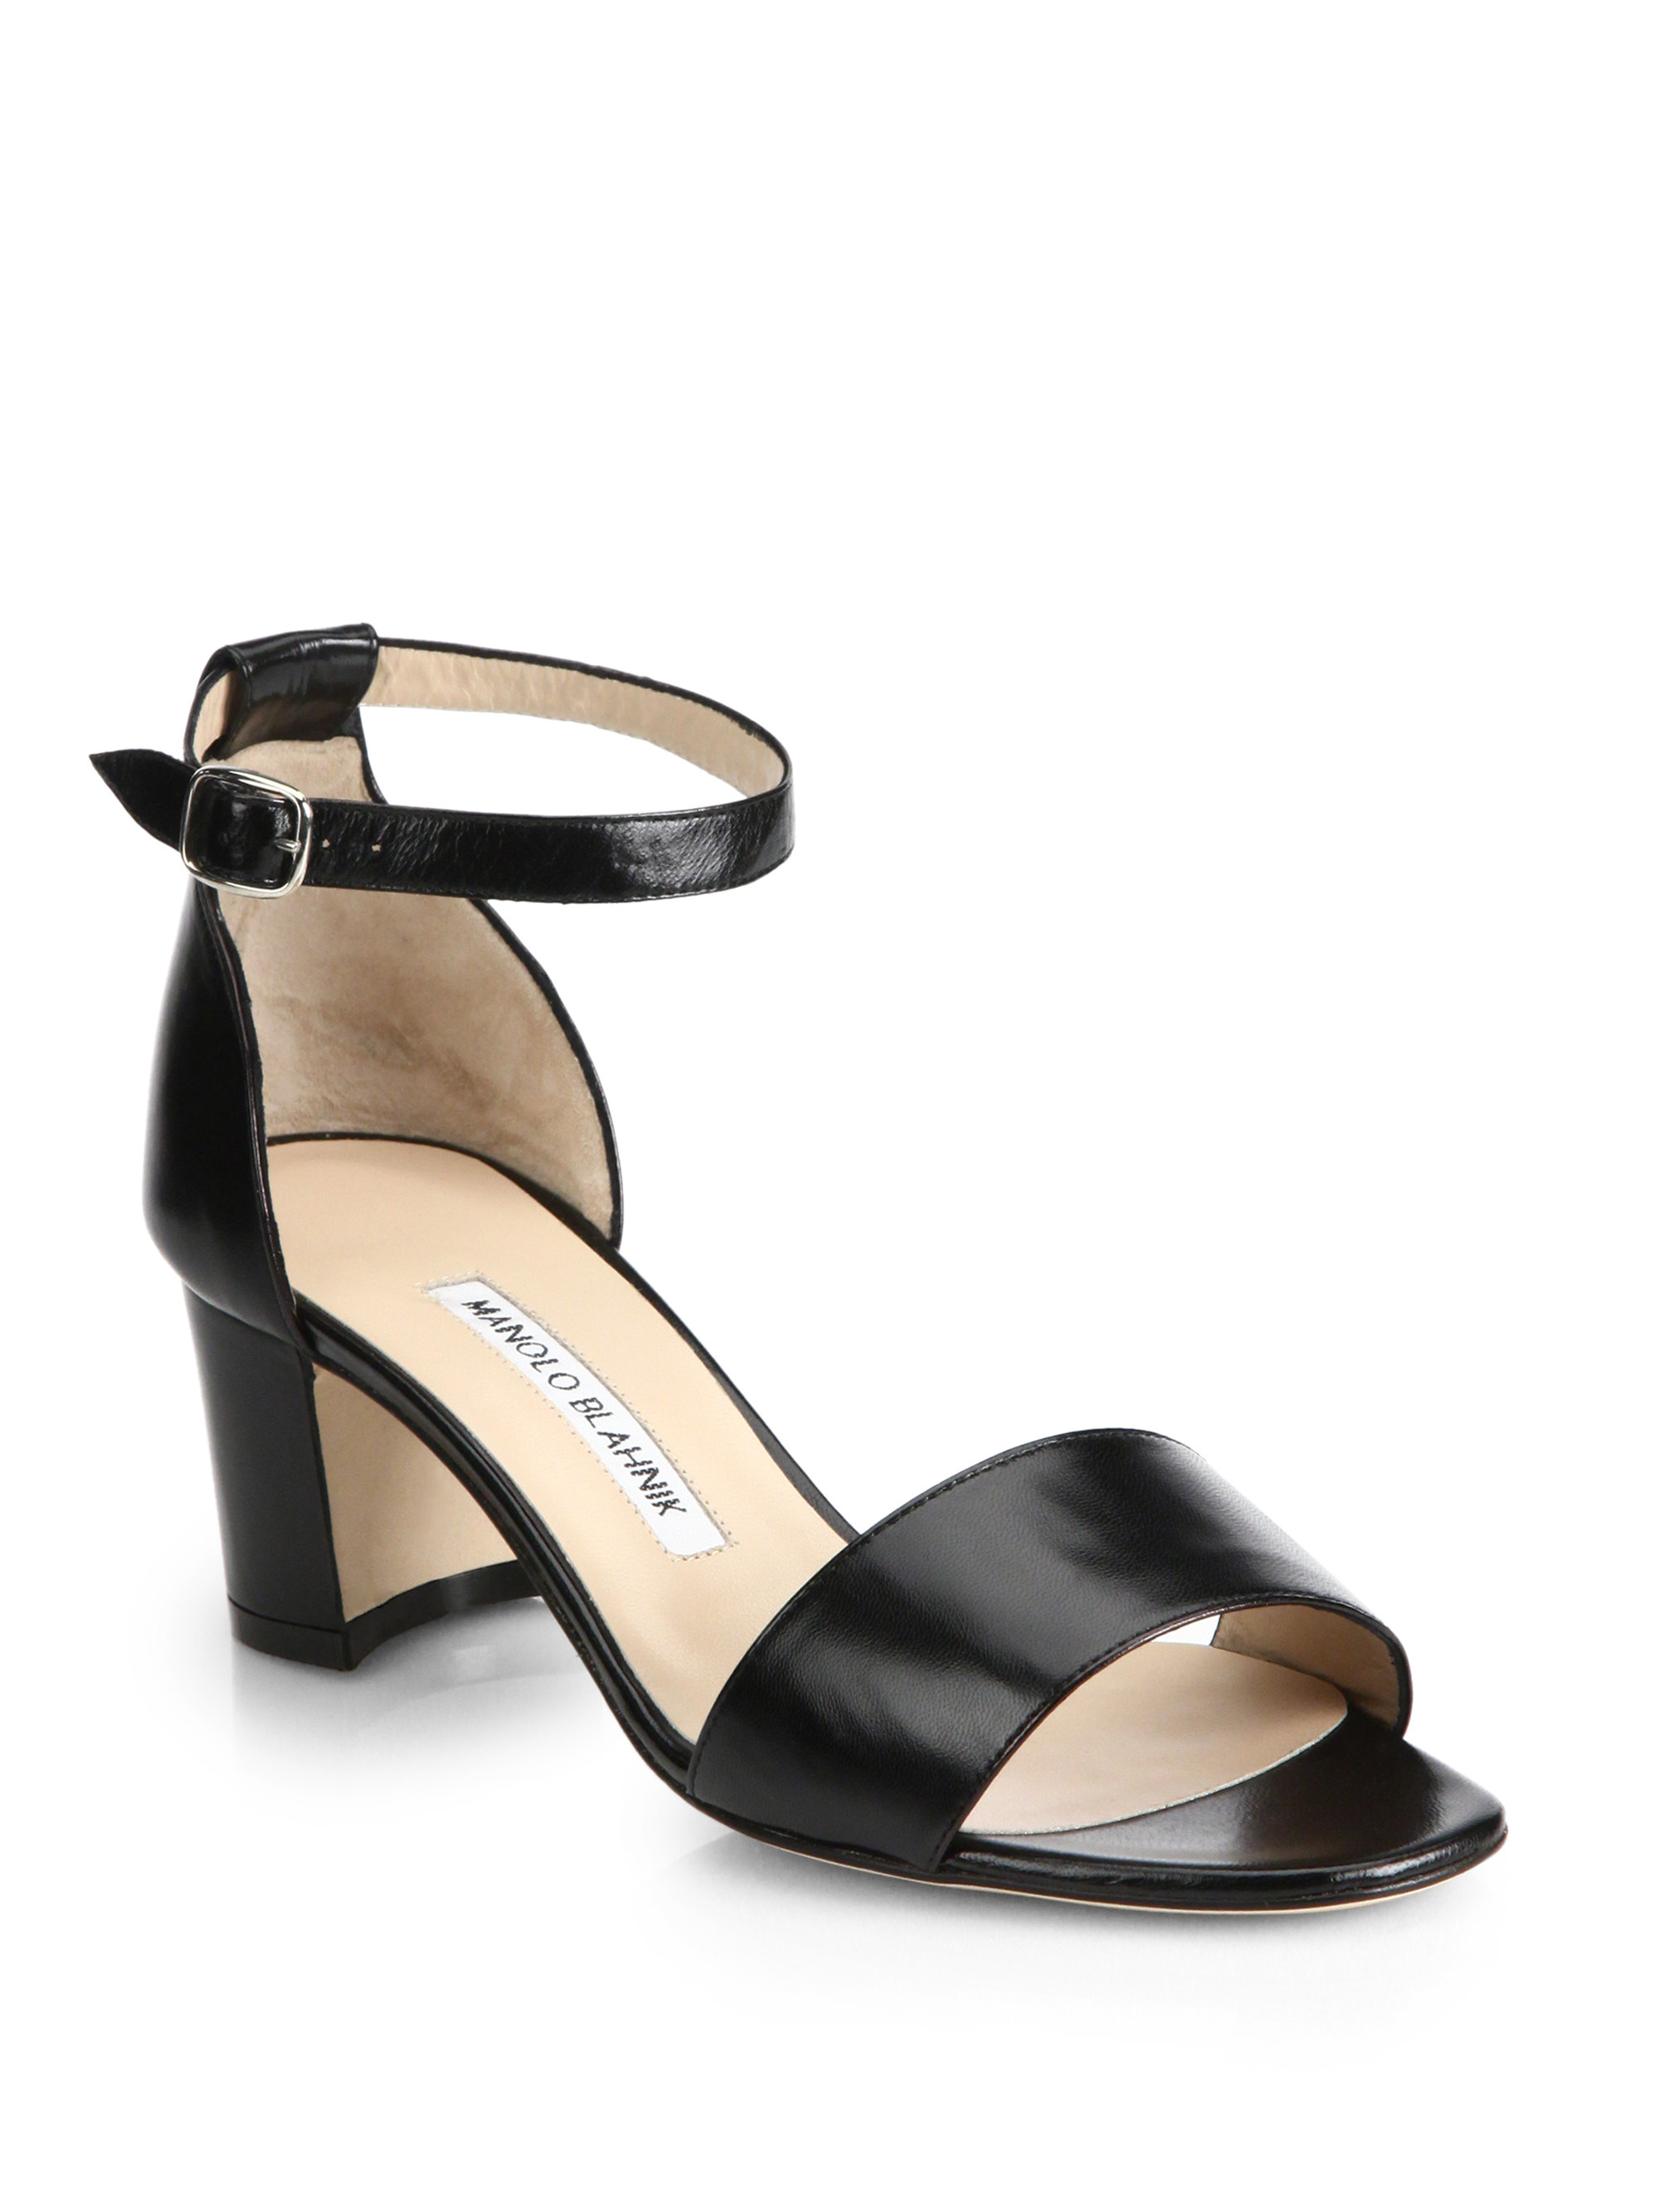 Manolo Blahnik Lauratom Ankle Strap Sandals discount genuine 2014 cheap sale cheap sale manchester great sale t00mOV1kSS